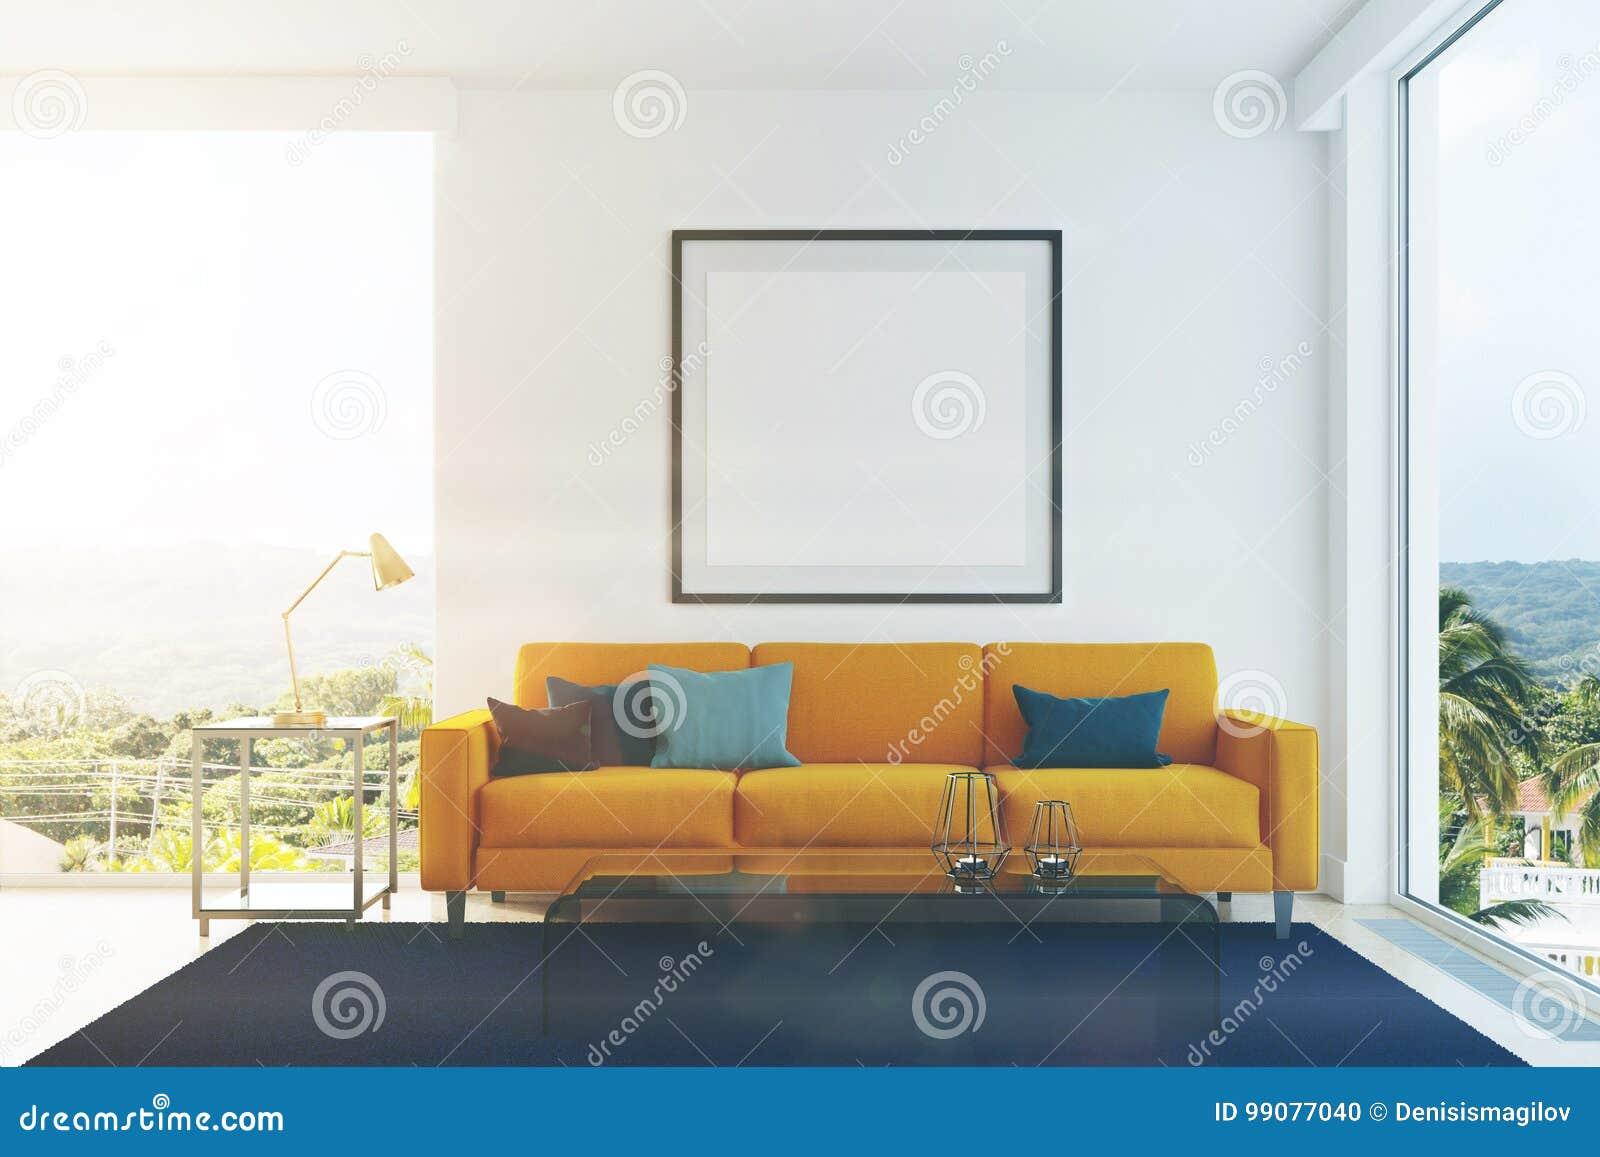 Le Sofa Jaune Bleu Repose Le Salon Modifie La Tonalite